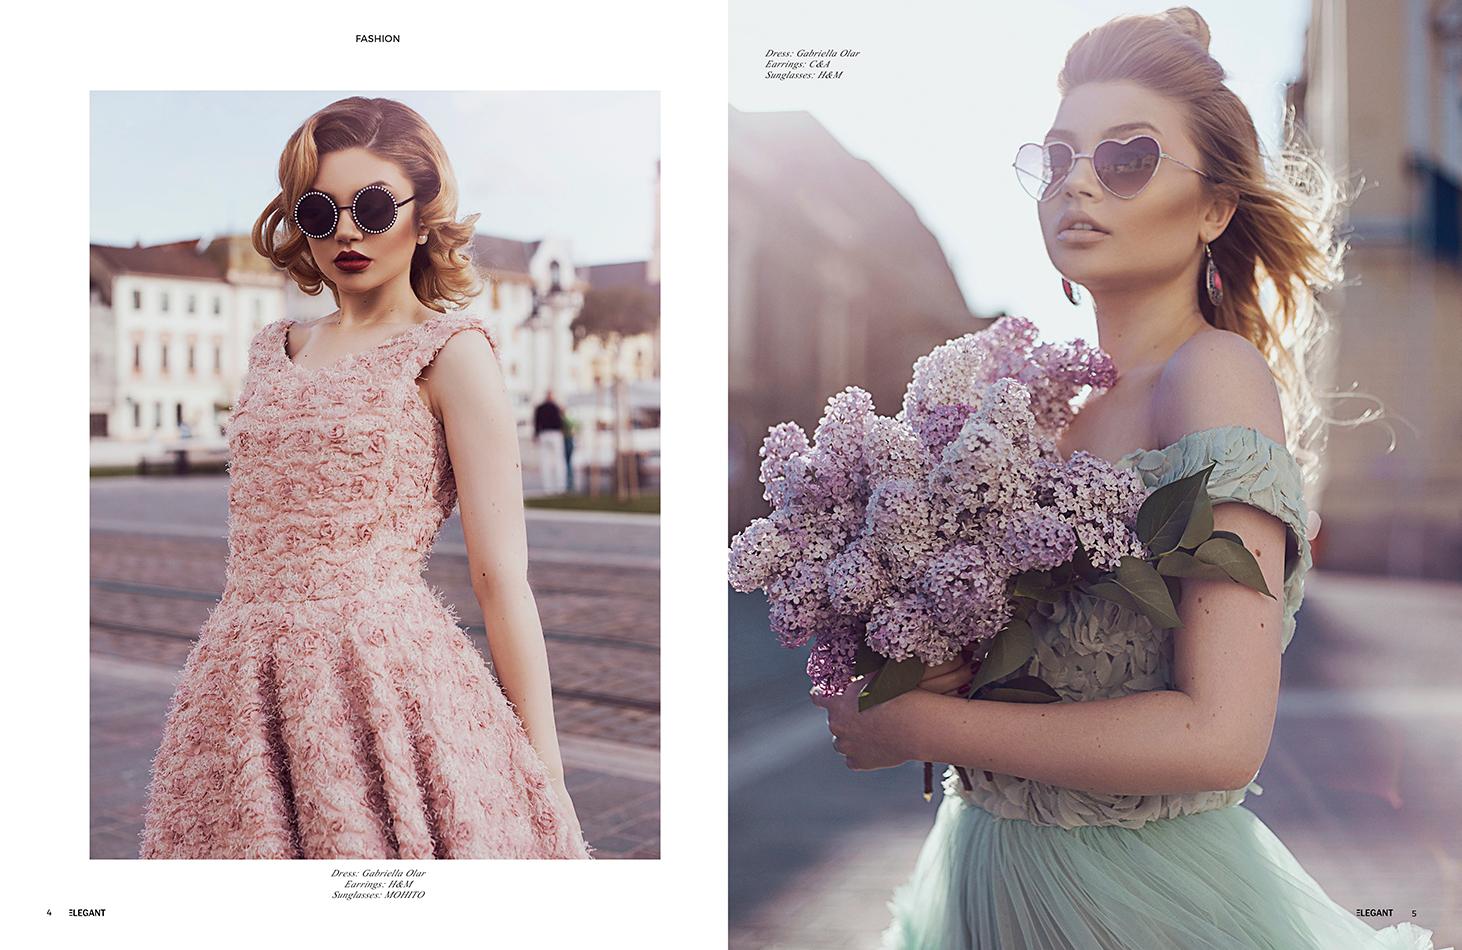 andreea-iancu-elegant-magazine-may-2017-2